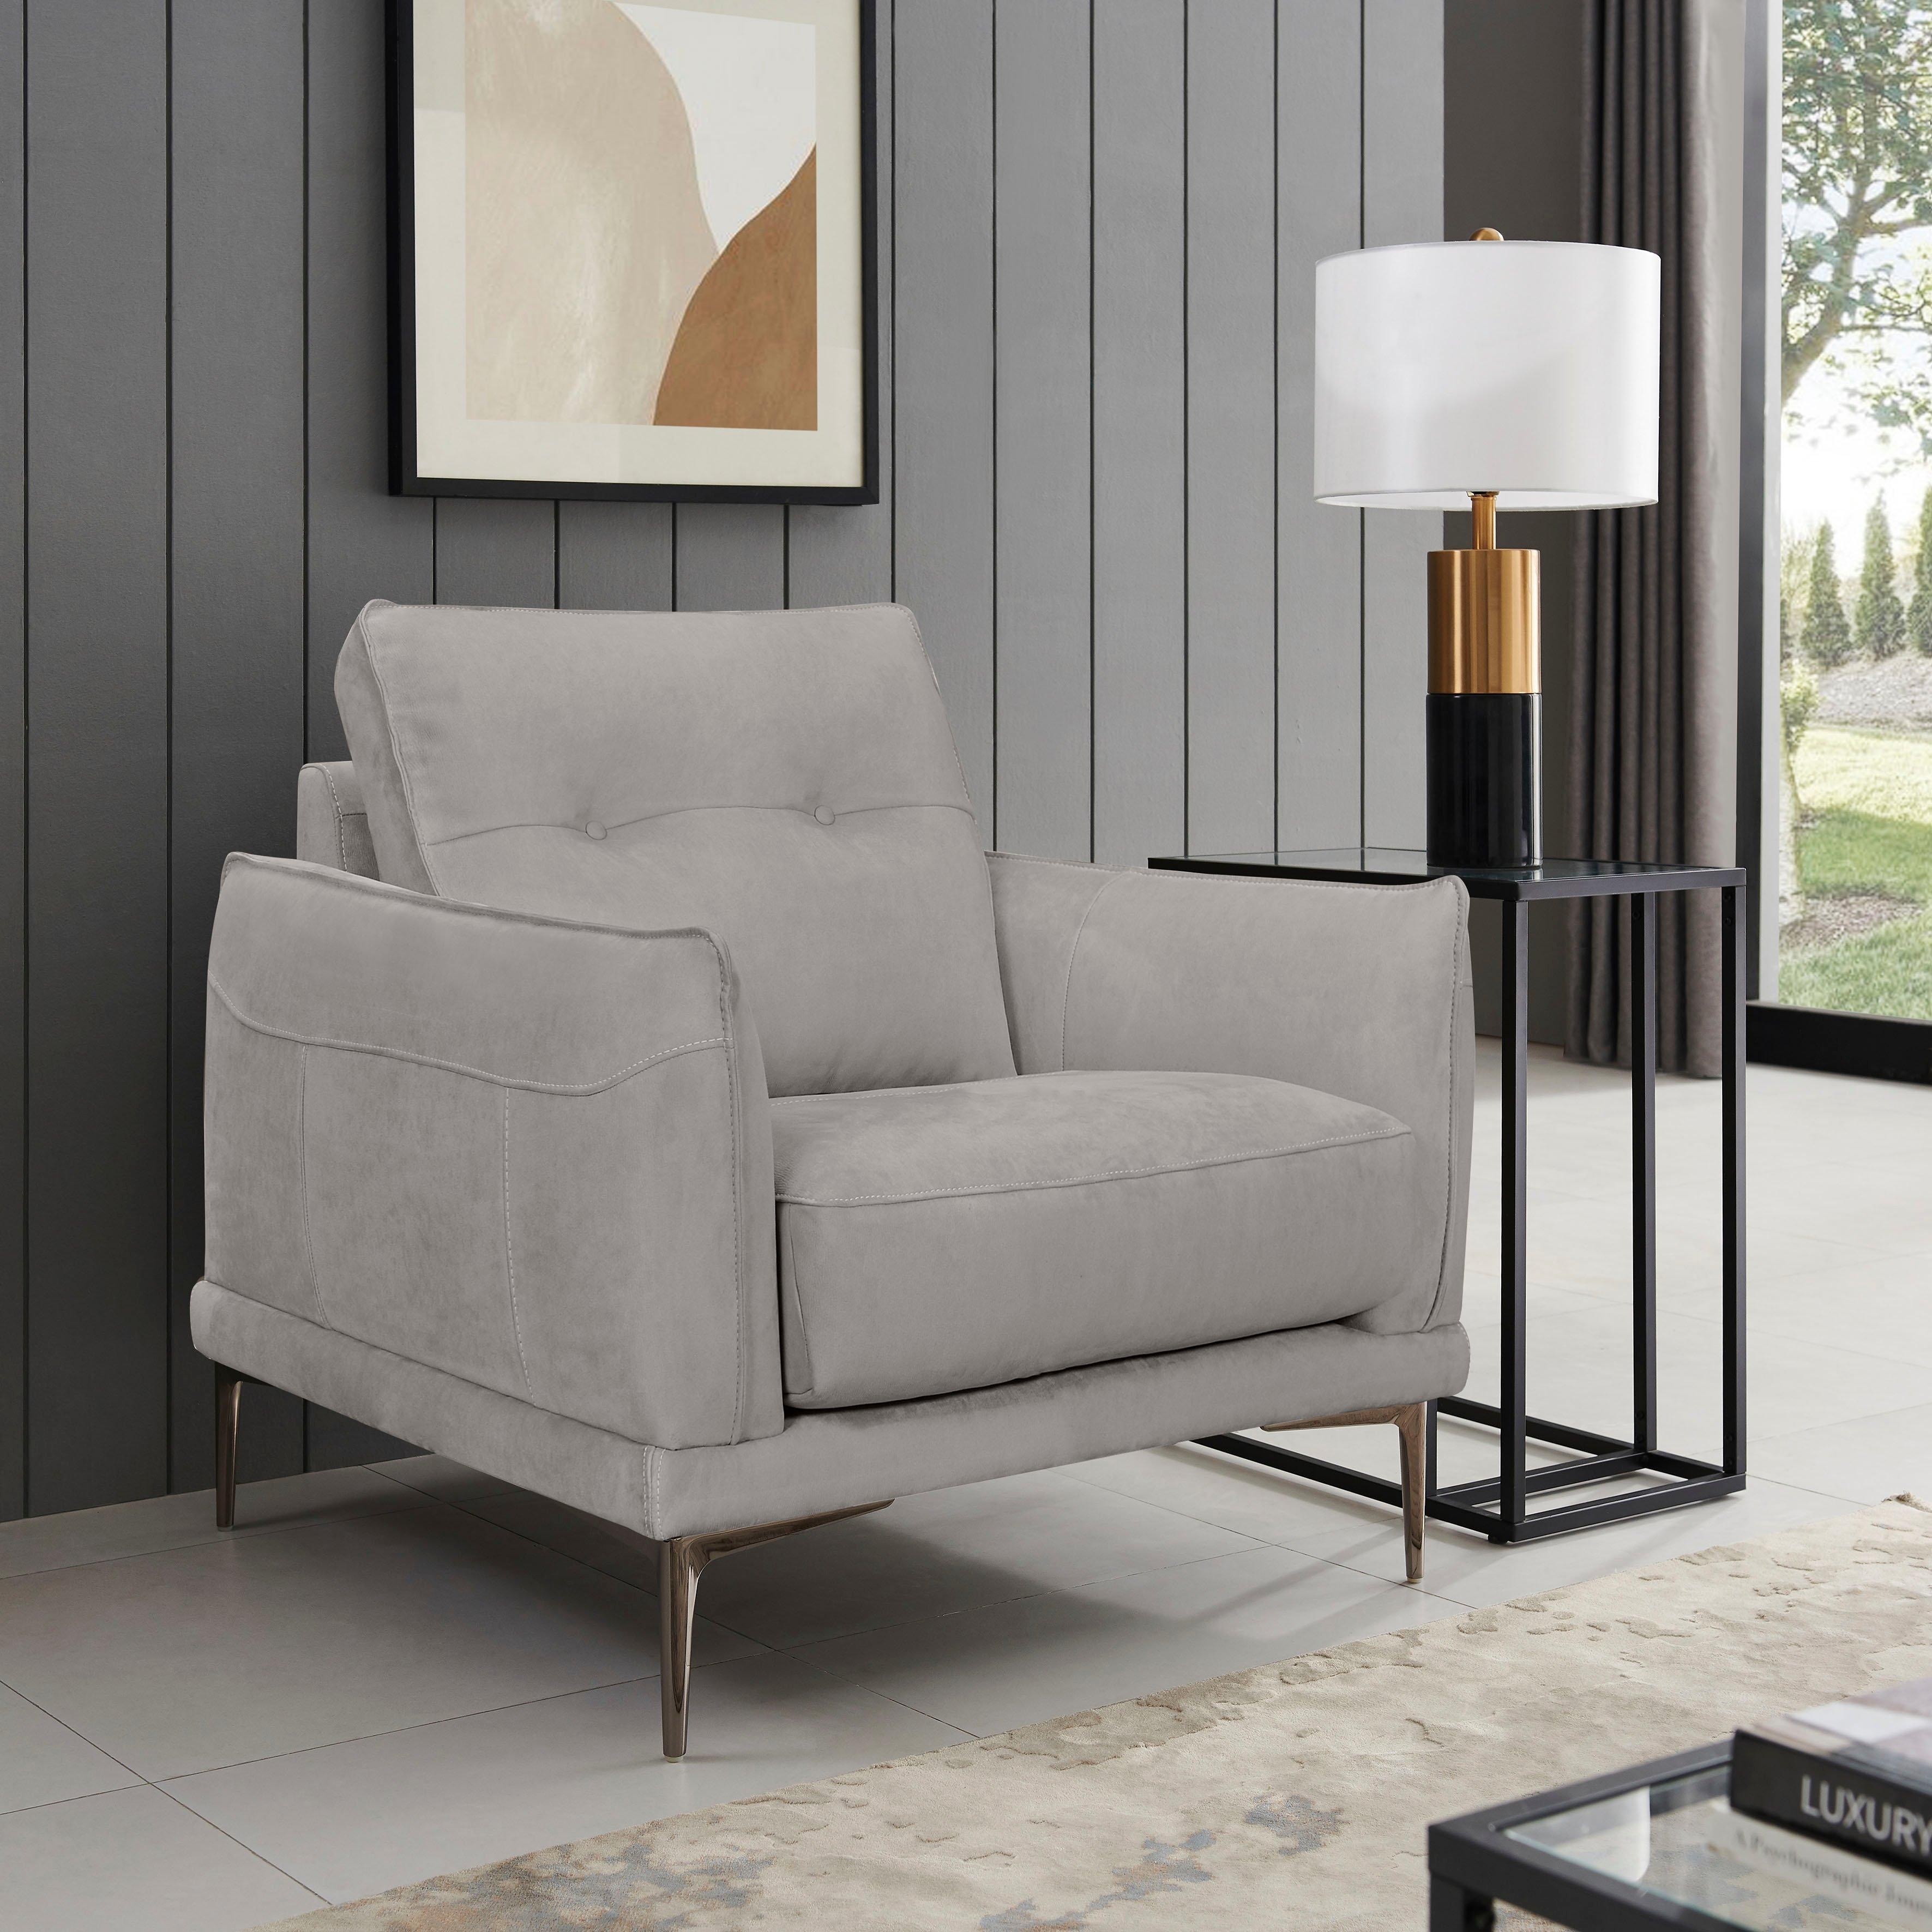 Places of Style fauteuil »Roseville« goedkoop op otto.nl kopen